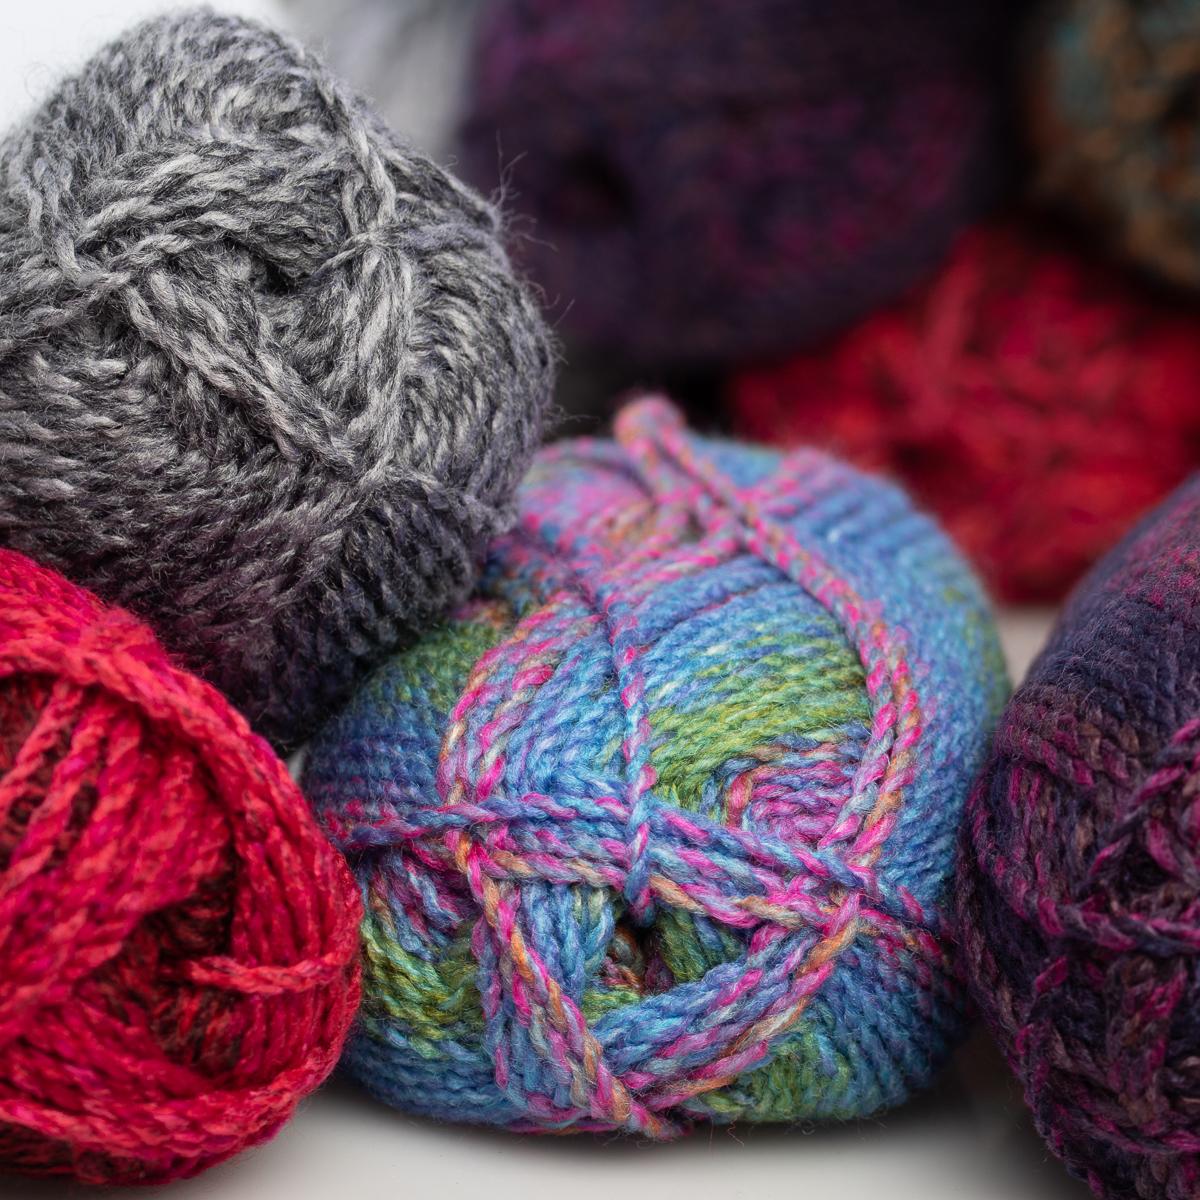 3pk-Lion-Brand-Yarn-100-Acrylic-Chunky-Yarn-Bulky-5-Soft-Knitting-Crocheting thumbnail 19